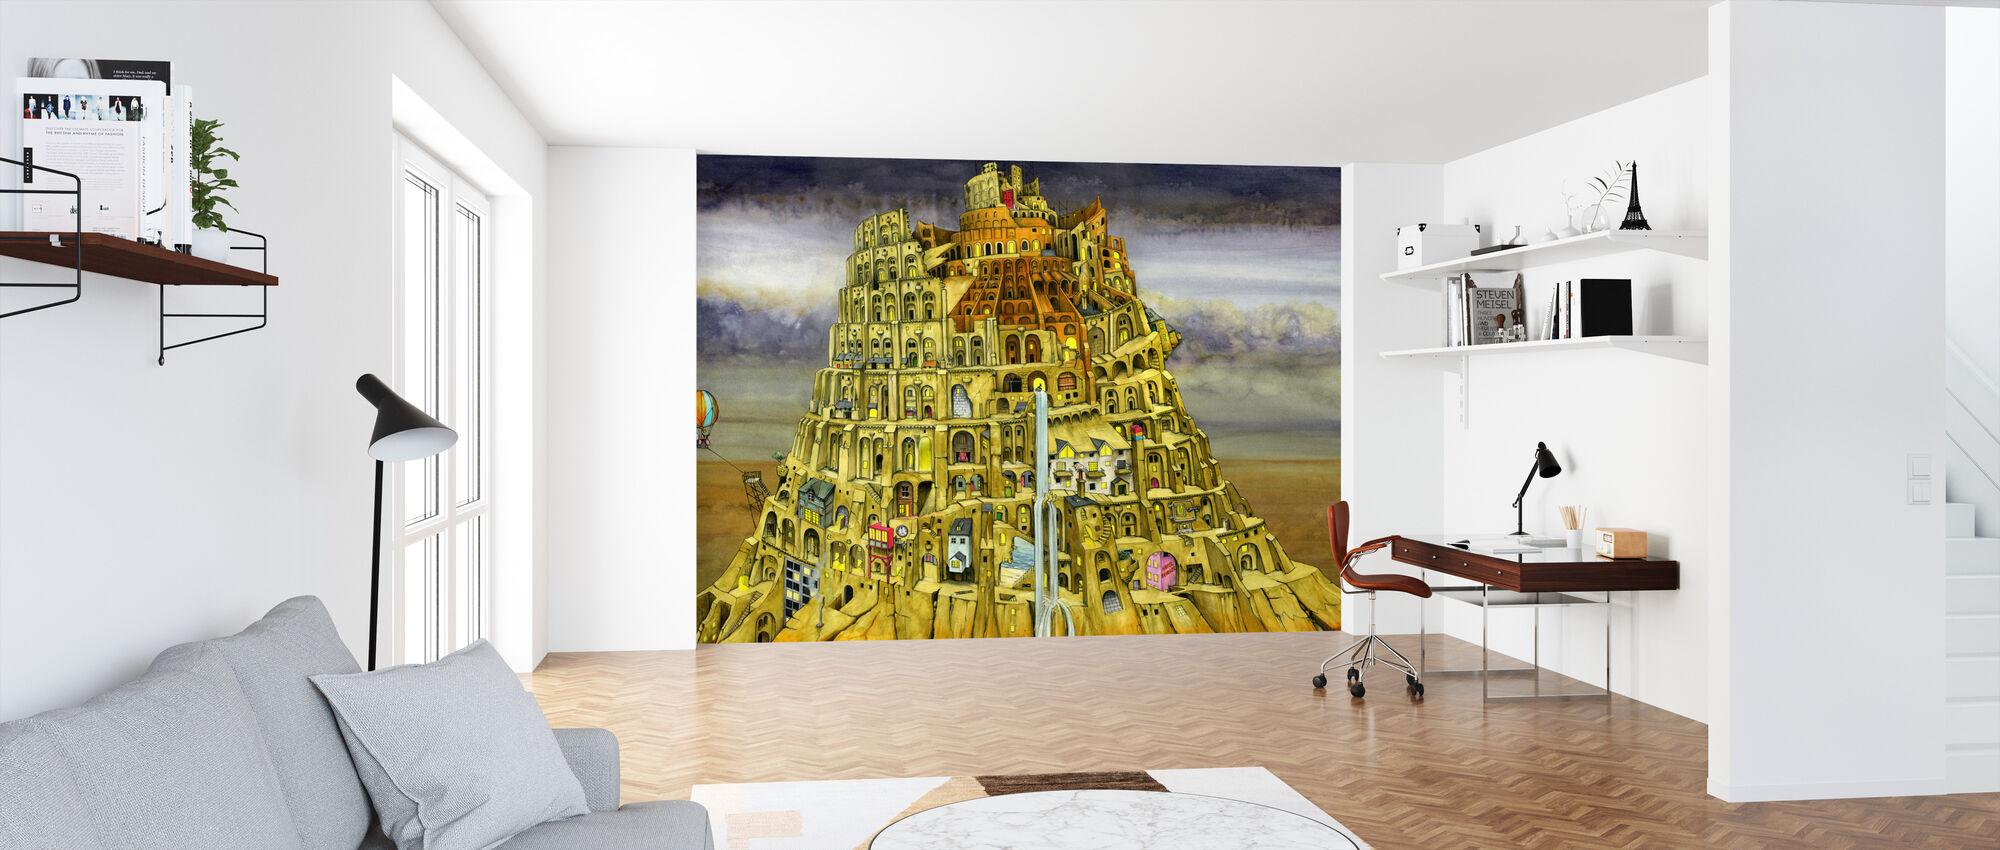 Babel - Wallpaper - Office